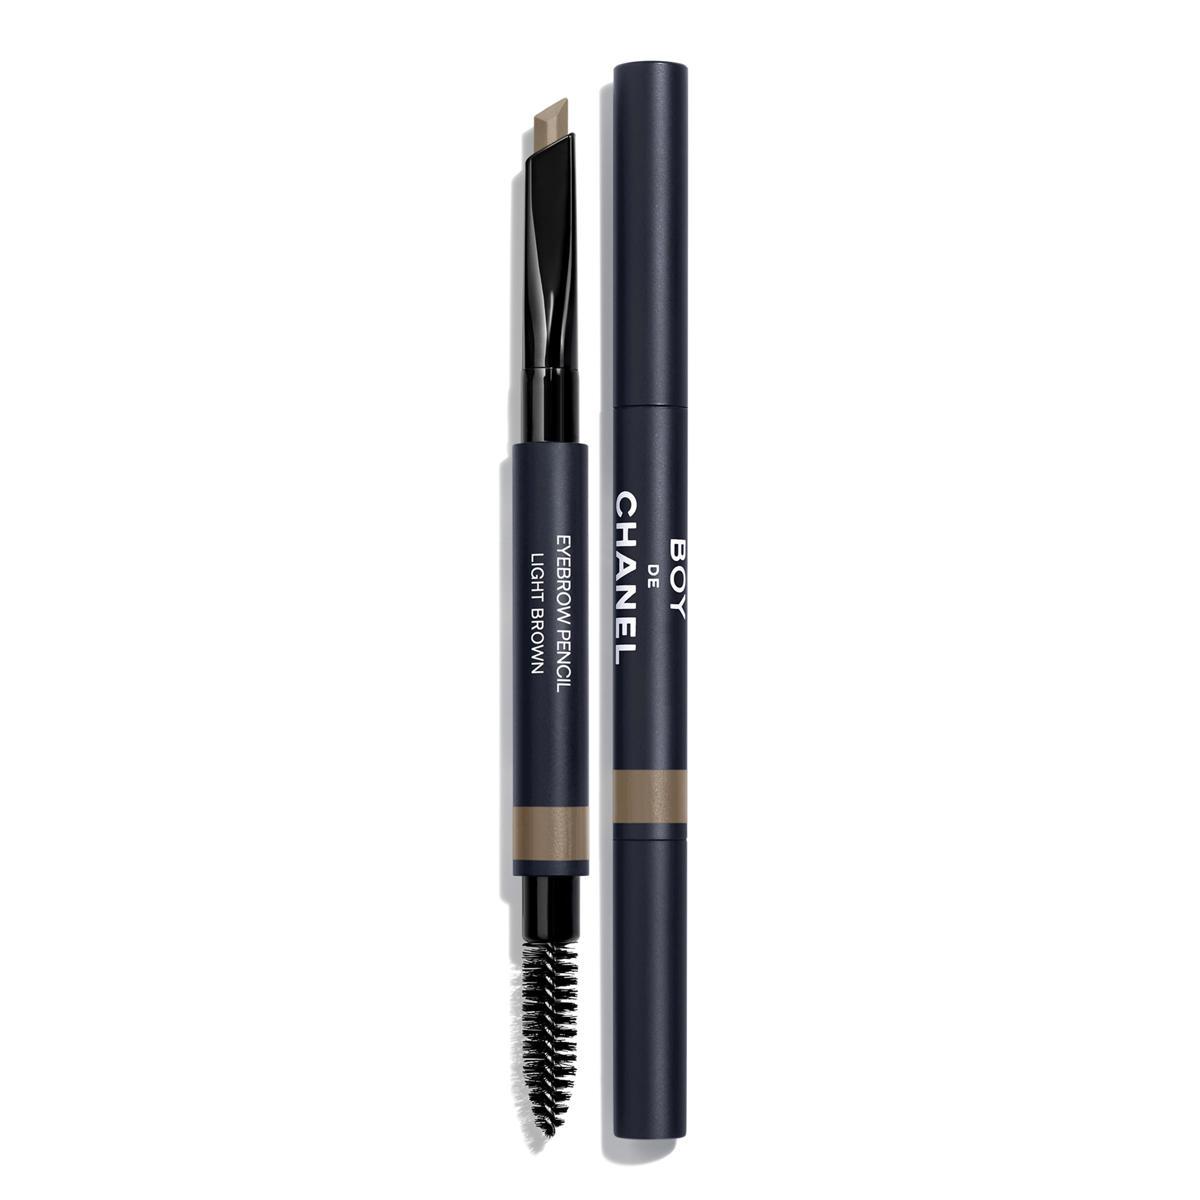 Boy De Chanel Eyebrow Pencil Light Brown 202